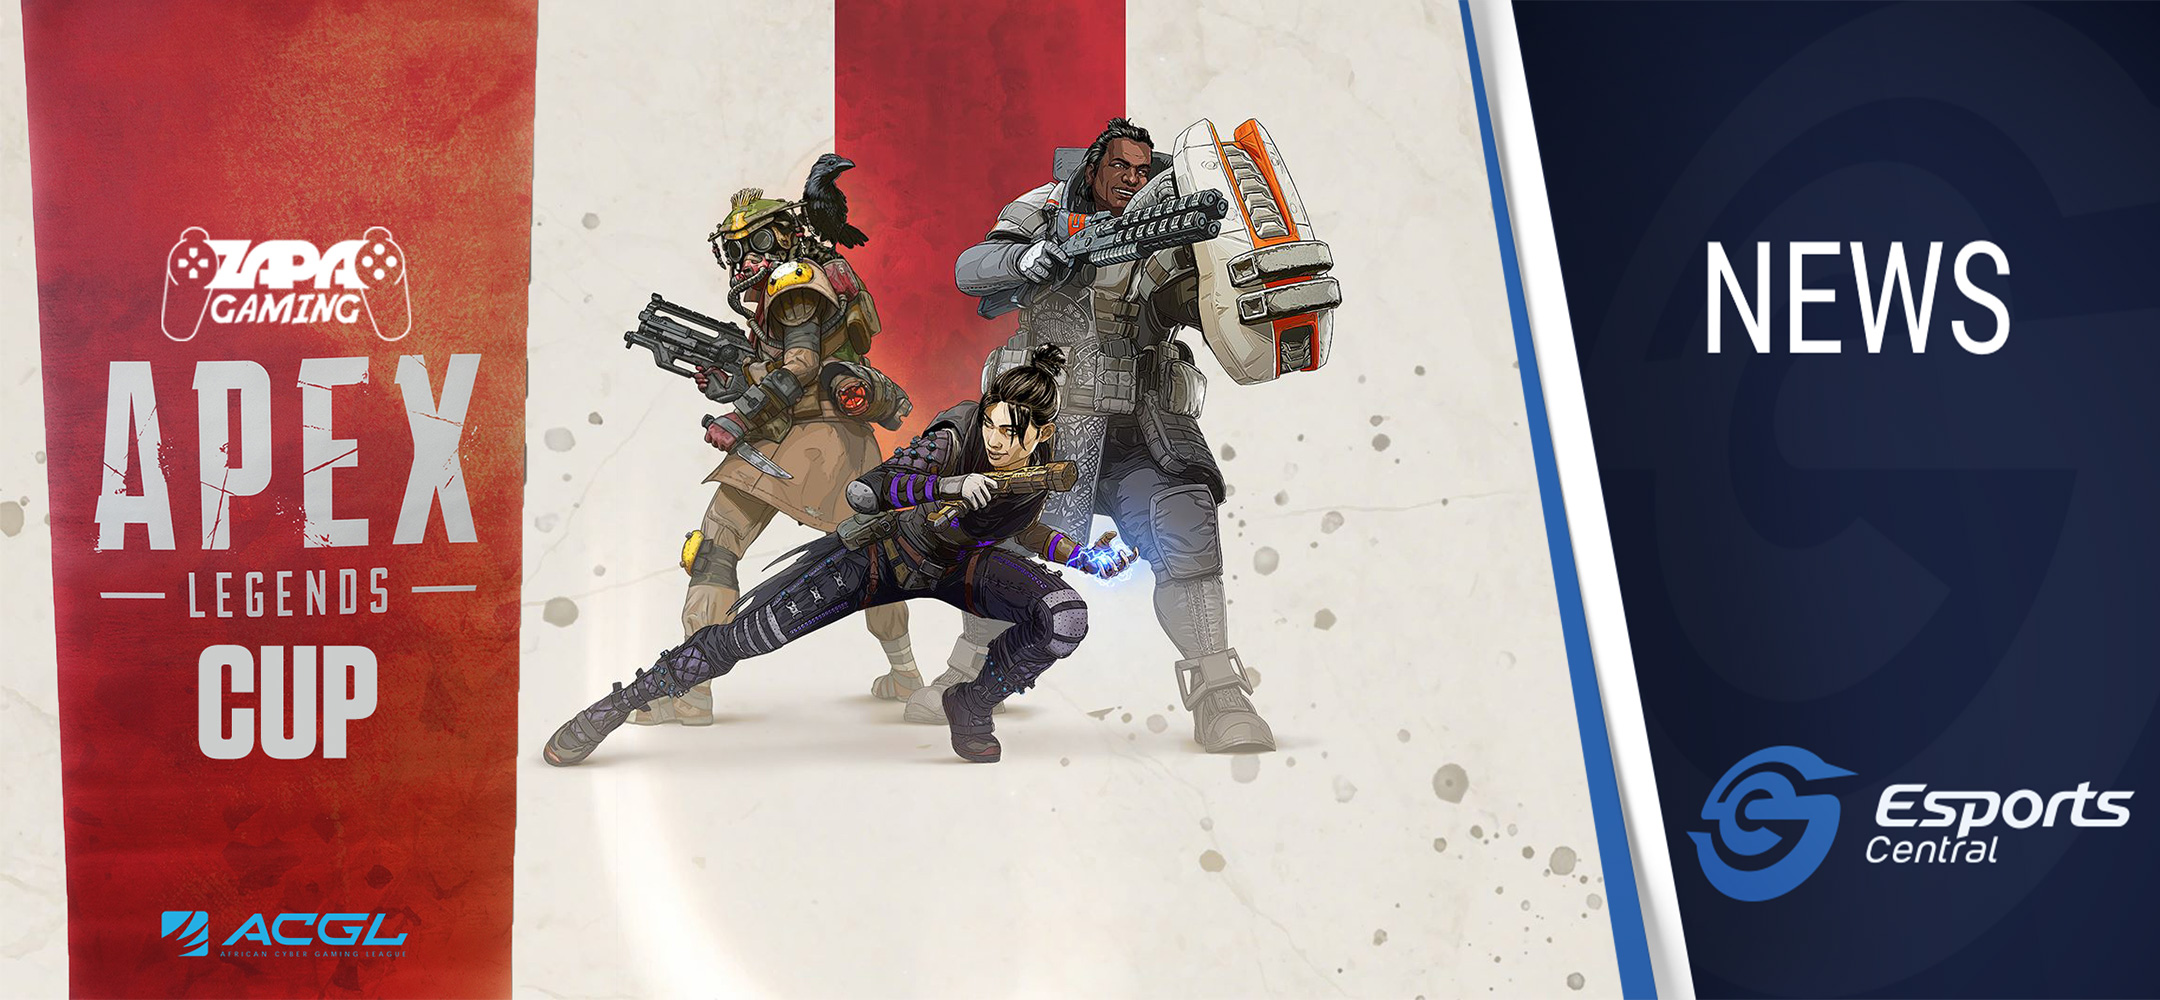 ZAPA Gaming Apex Legends